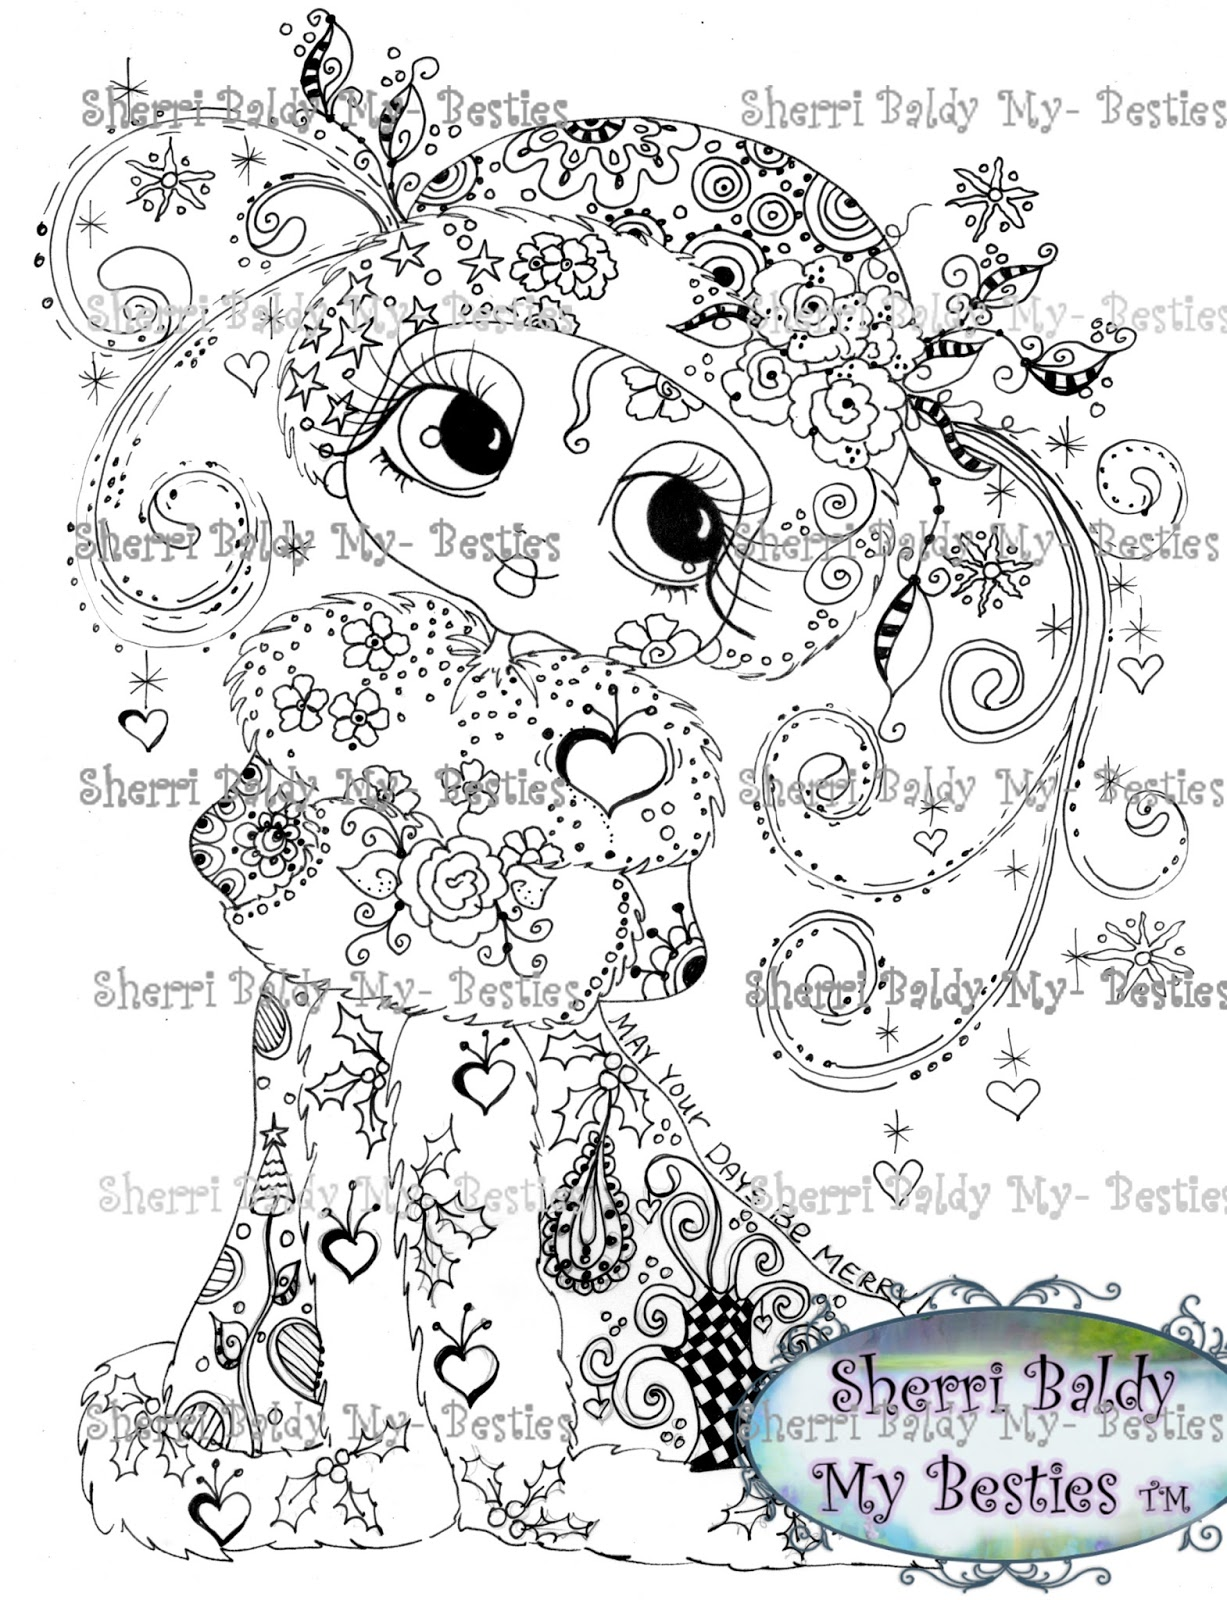 Sherri Baldy Art: Sherri Baldy's Brand New Release